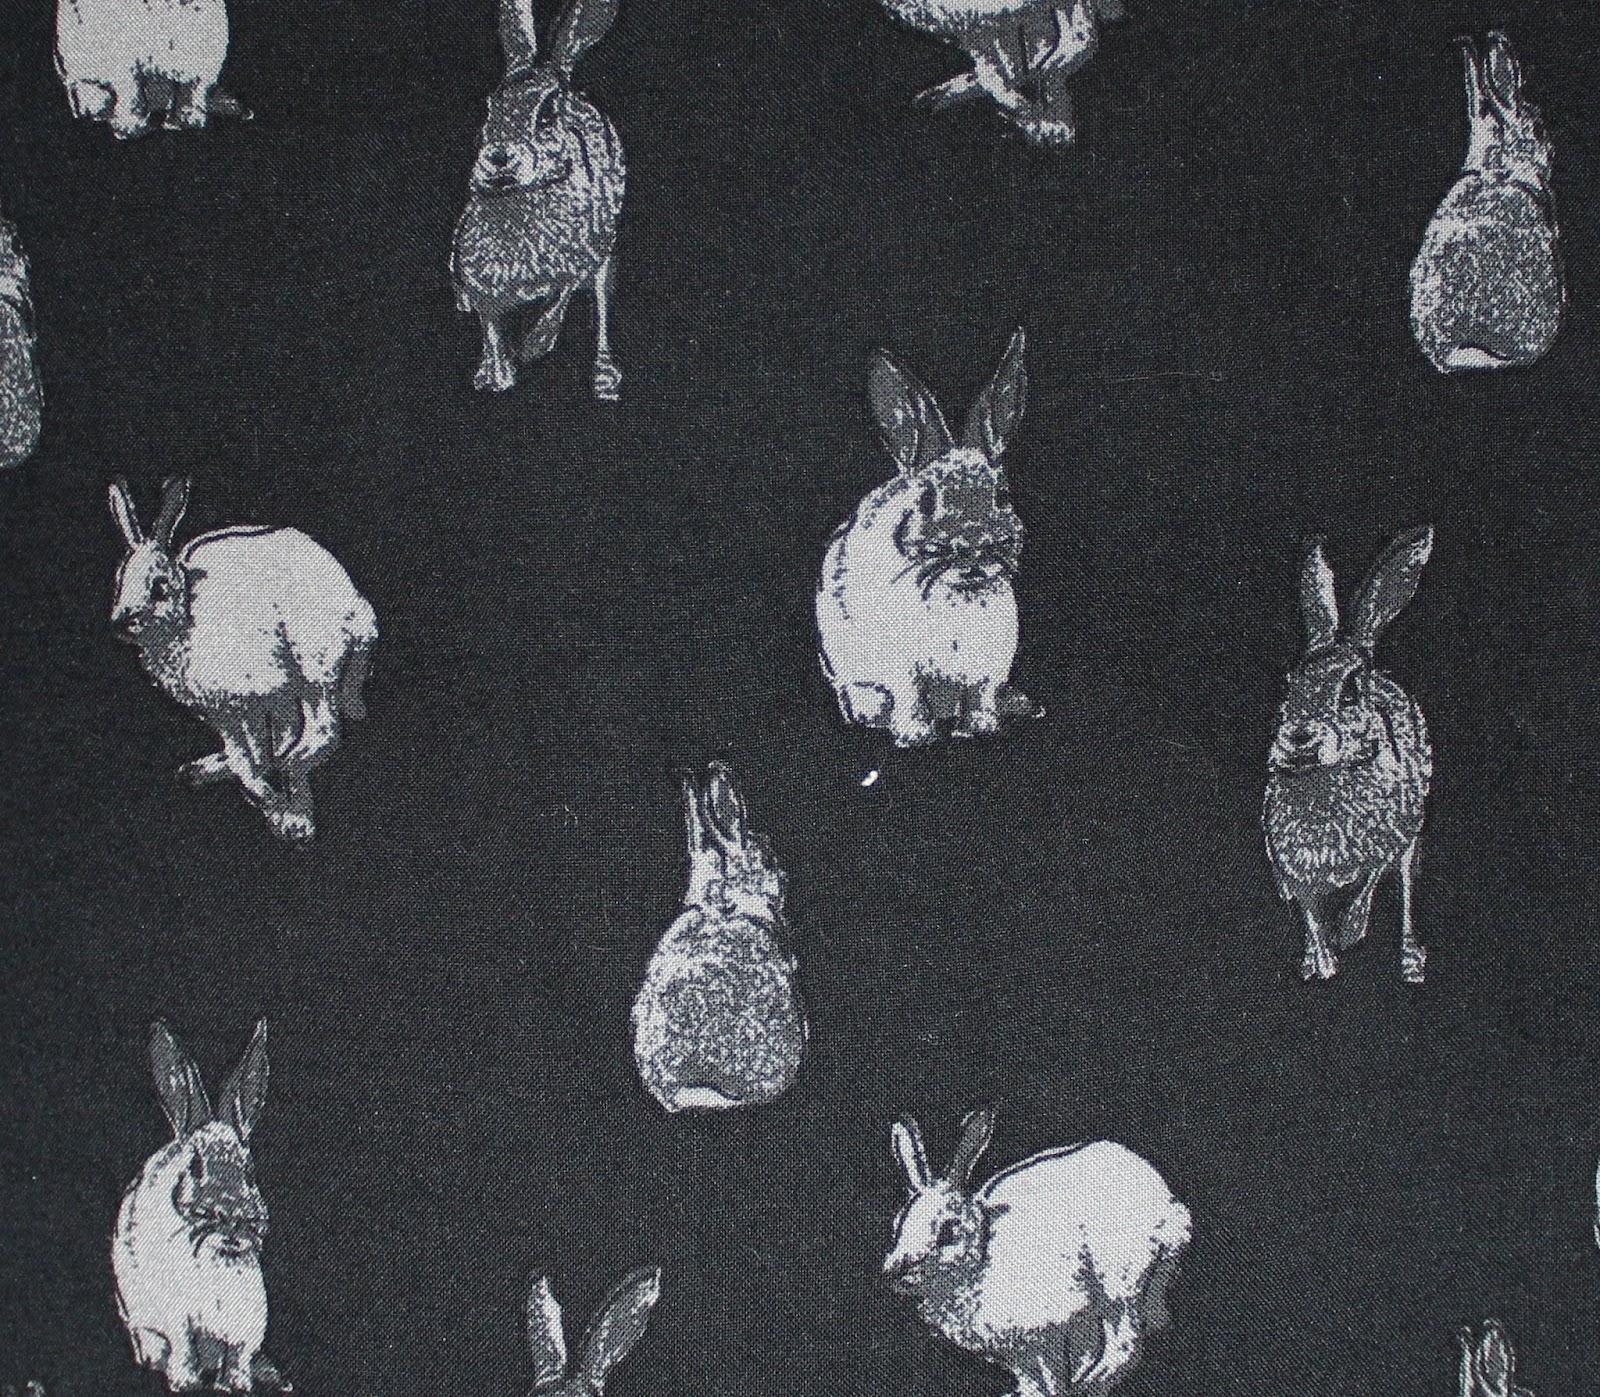 julia u0027s fashion minute fashion dress with bunny print